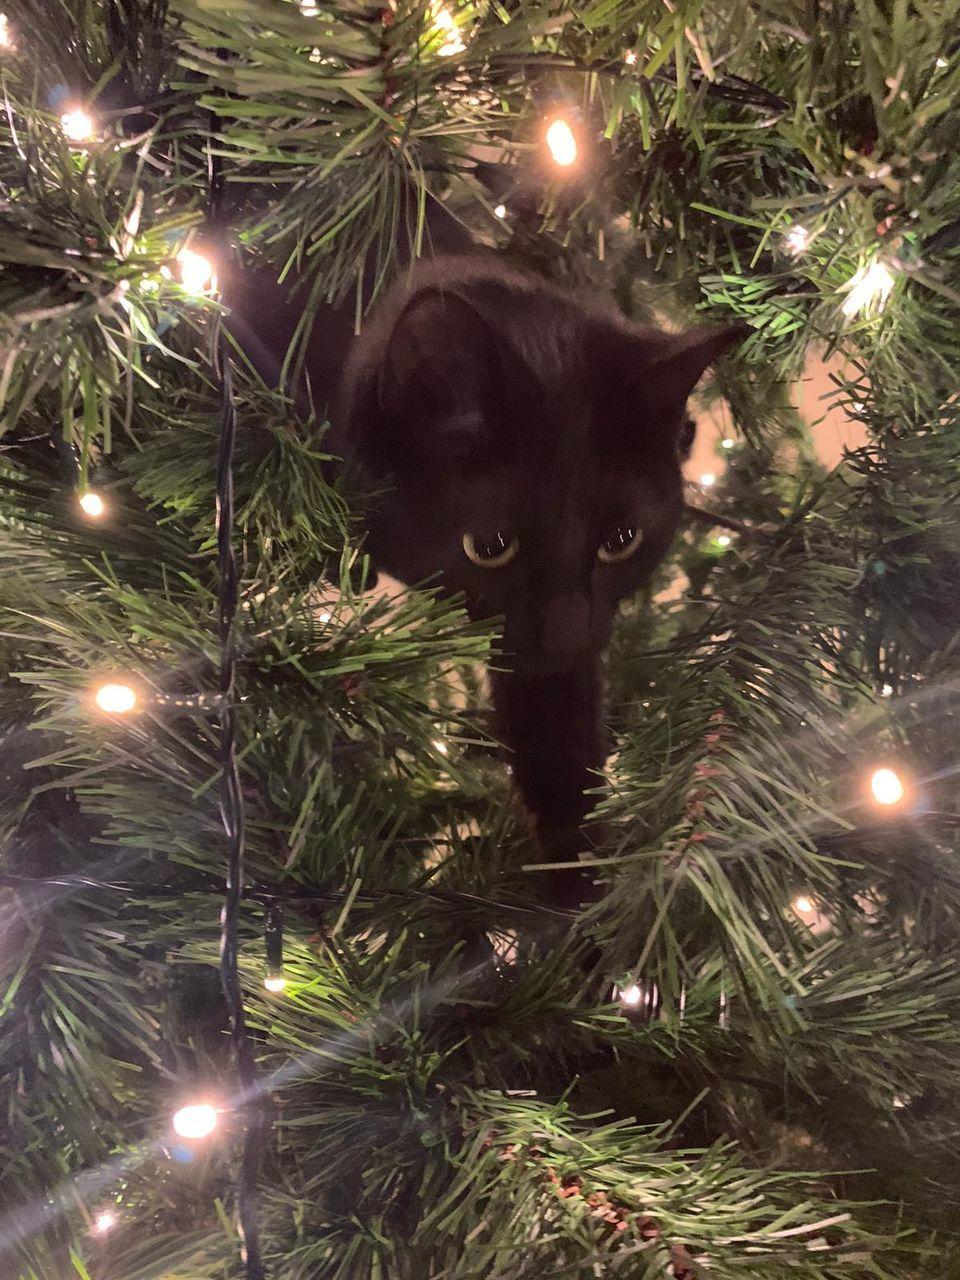 CAT ON ILLUMINATED CHRISTMAS LIGHTS